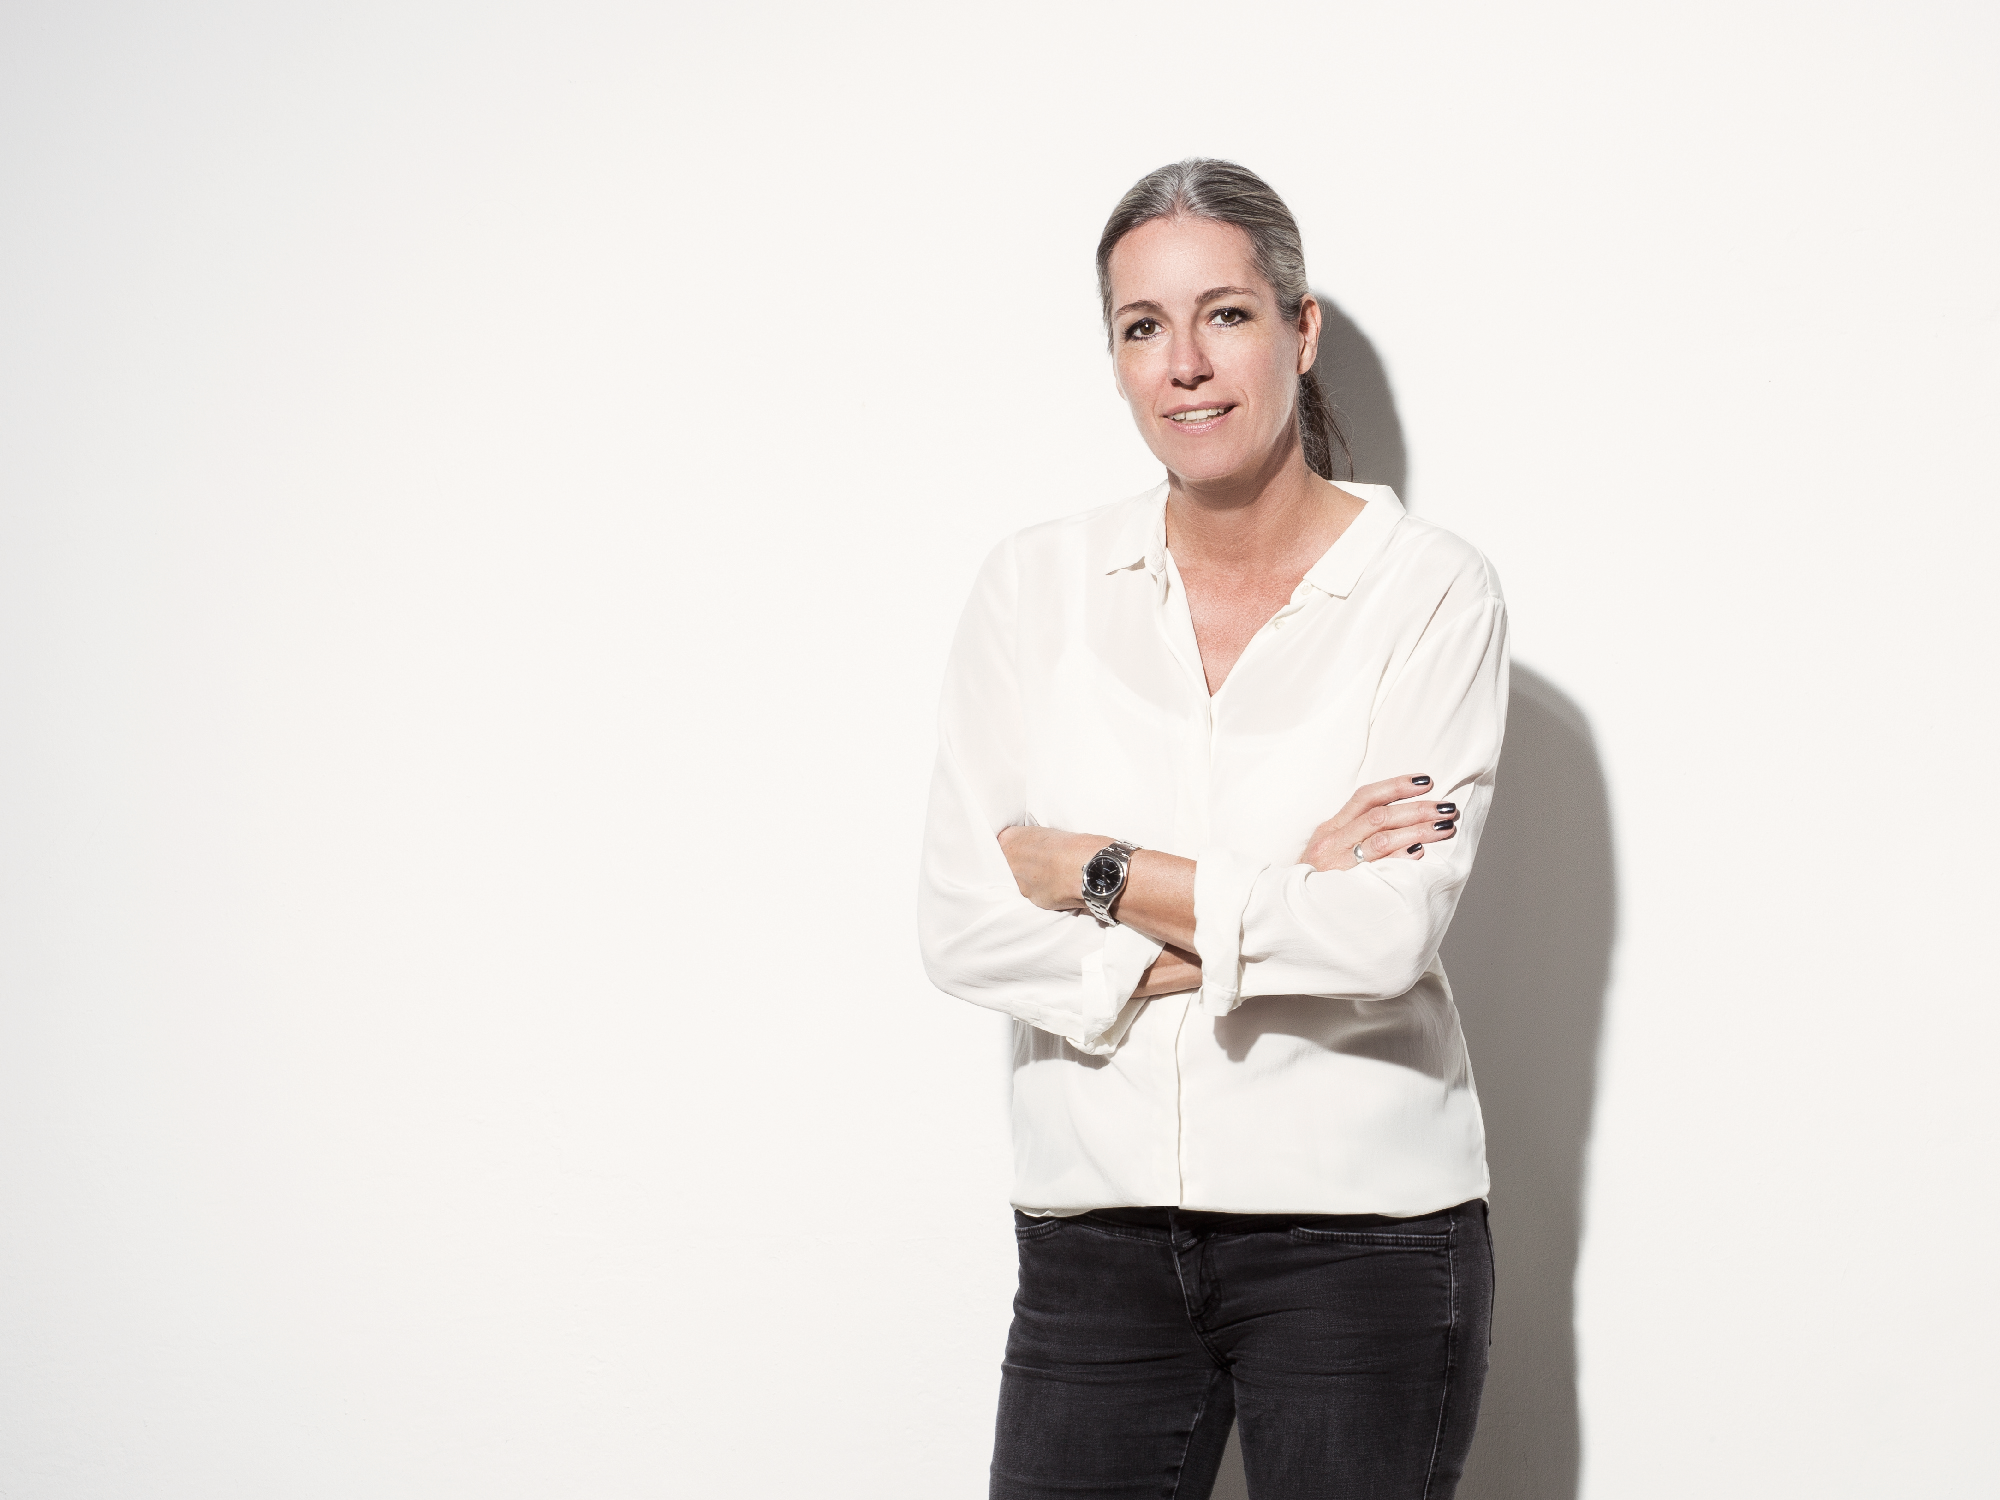 silke-gueldner-coaching-fotografen-hamburg-Portrait